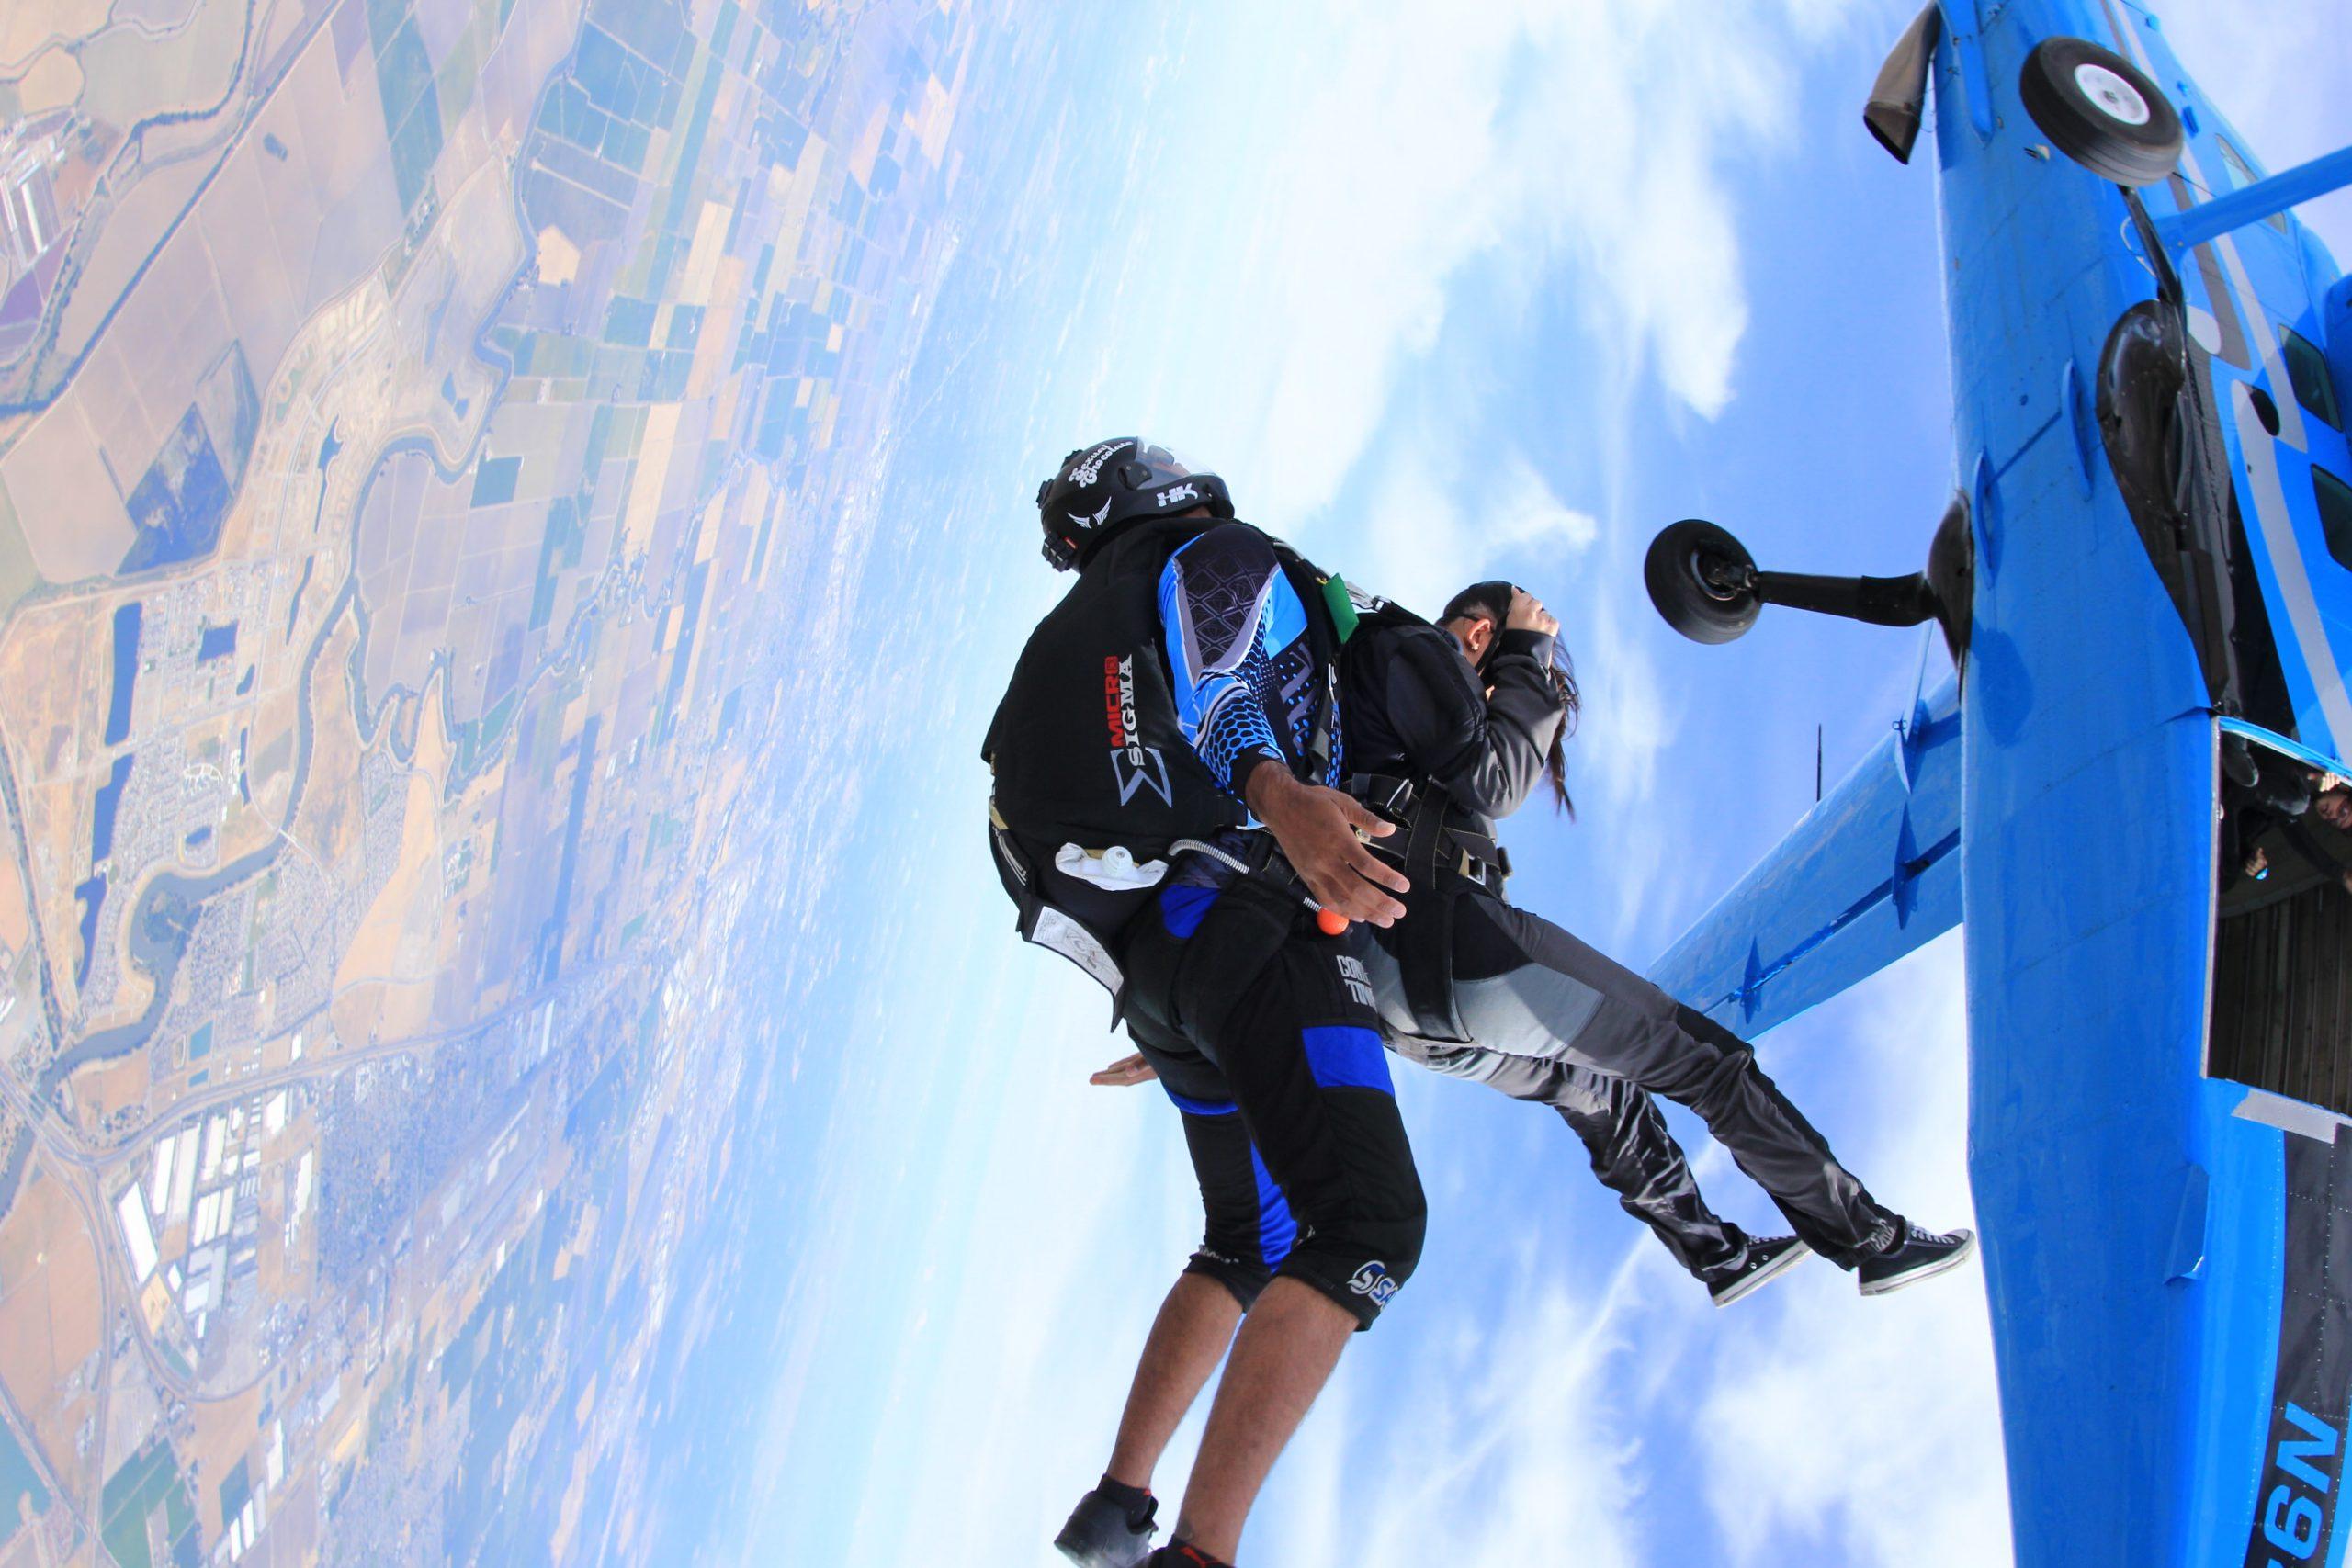 exiting from a Grand Caravan at Skydive California